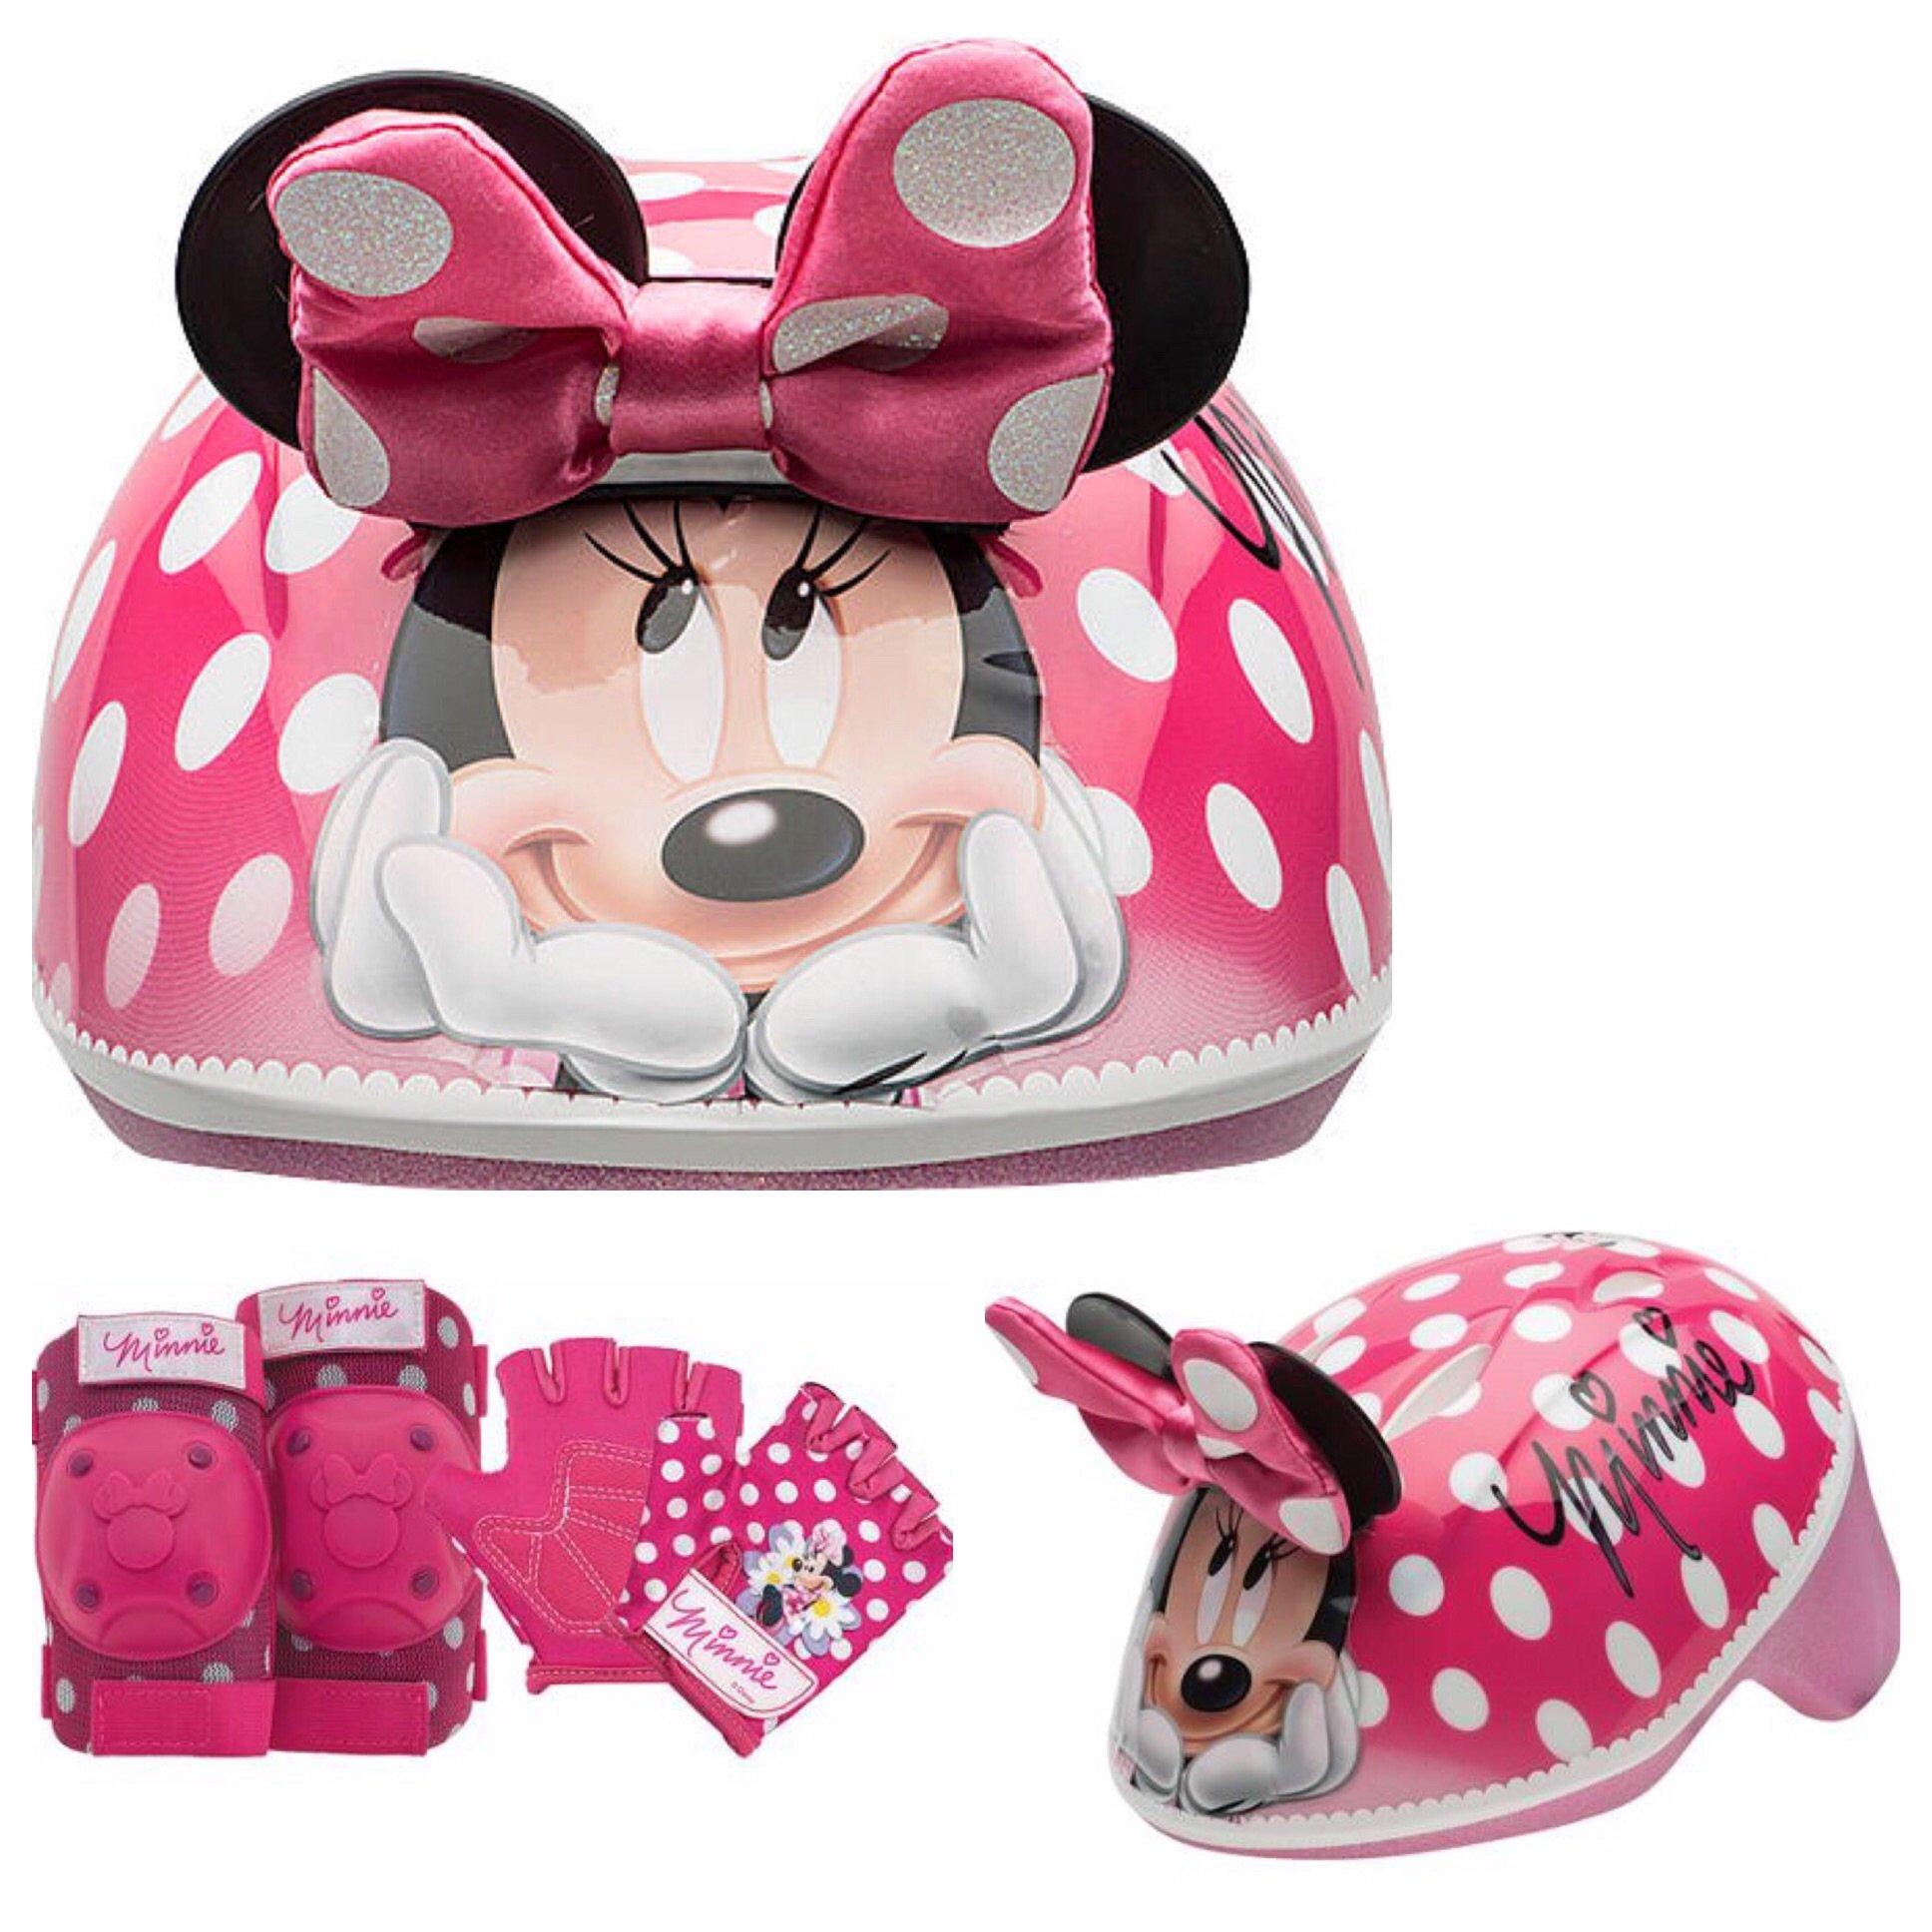 Disney Girls Minnie Mouse Kids Skate / Bike Helmet Pads & Gloves - 7 Piece Set by Disney